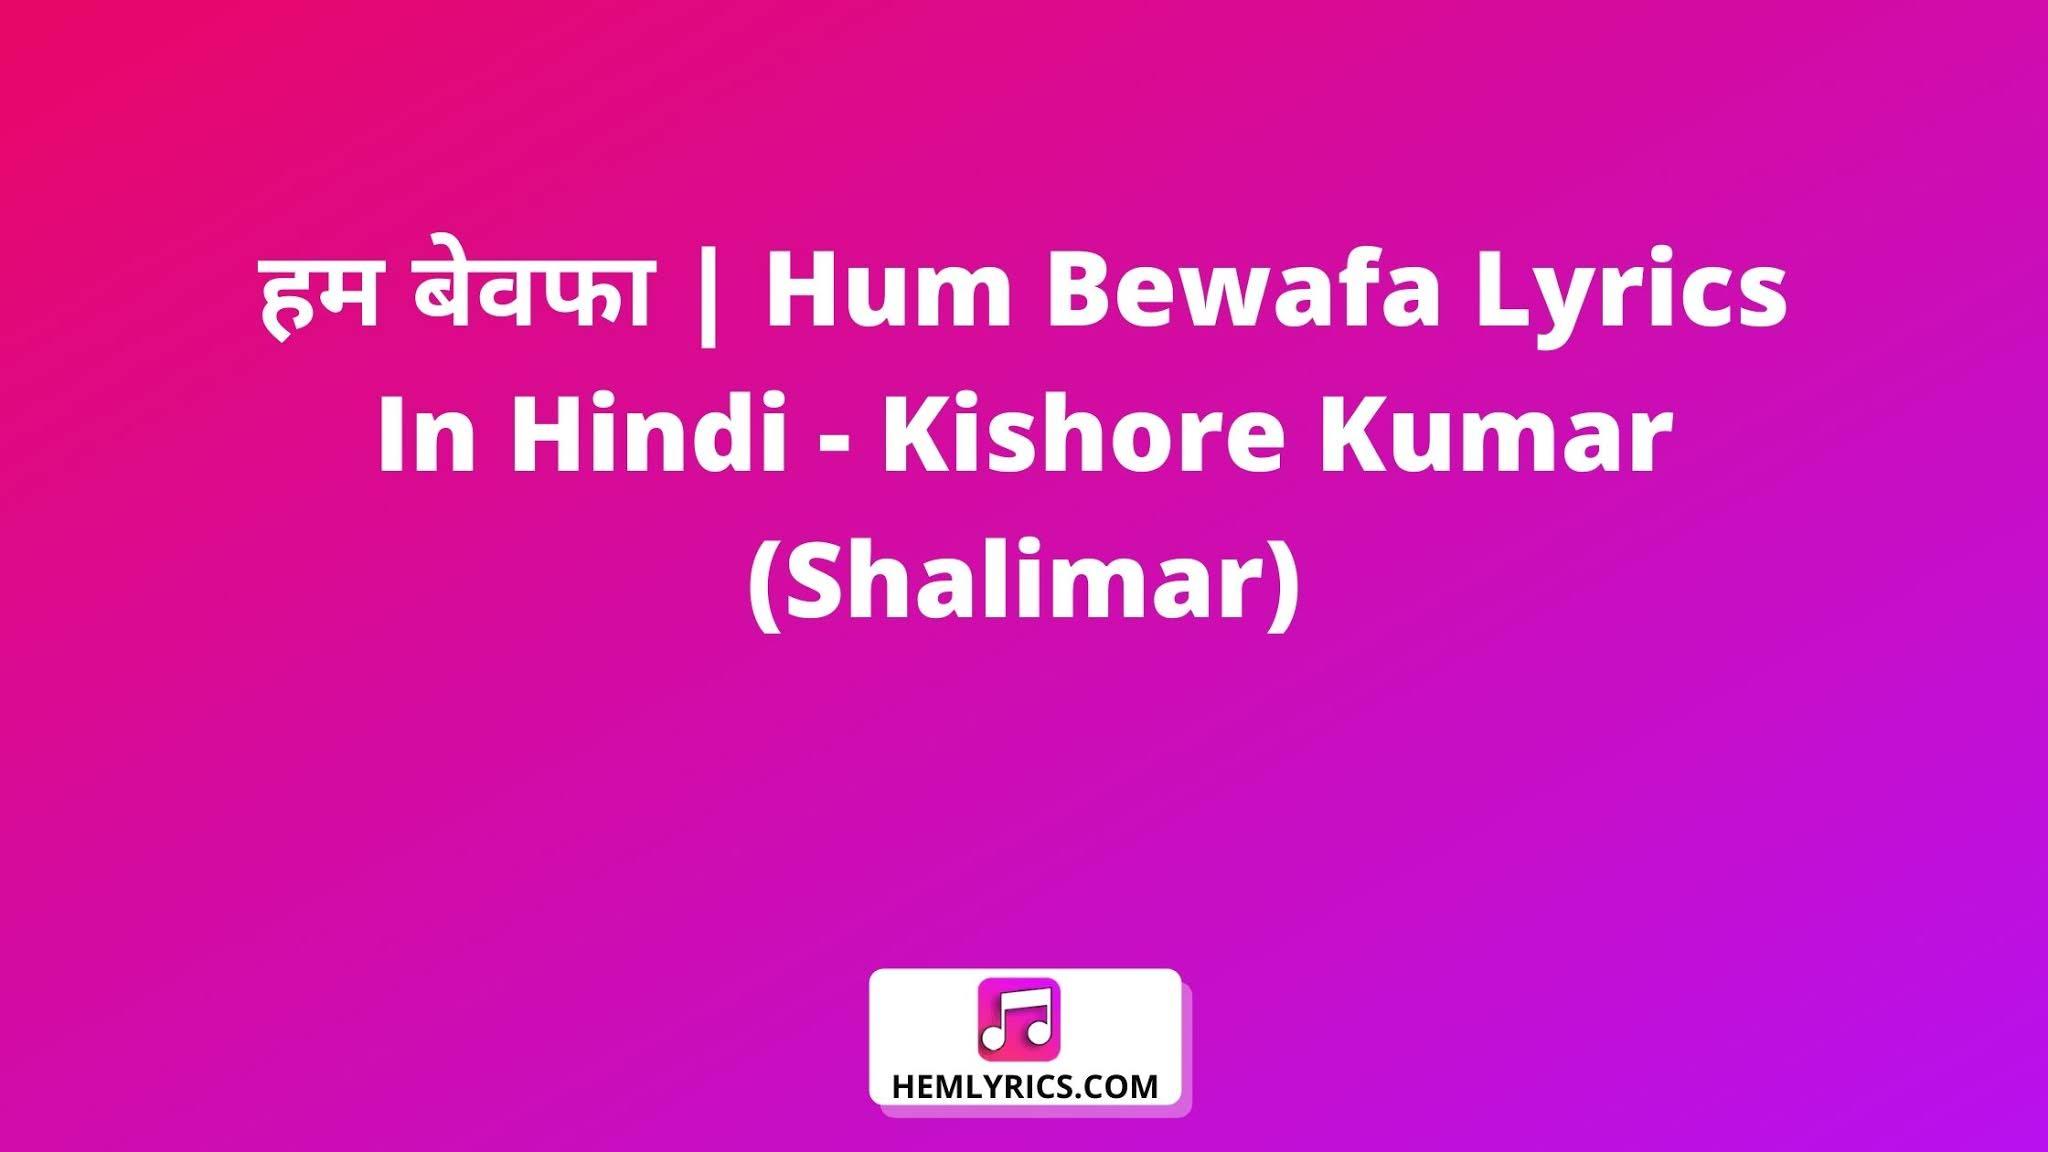 हम बेवफा | Hum Bewafa Lyrics In Hindi - Kishore Kumar (Shalimar)